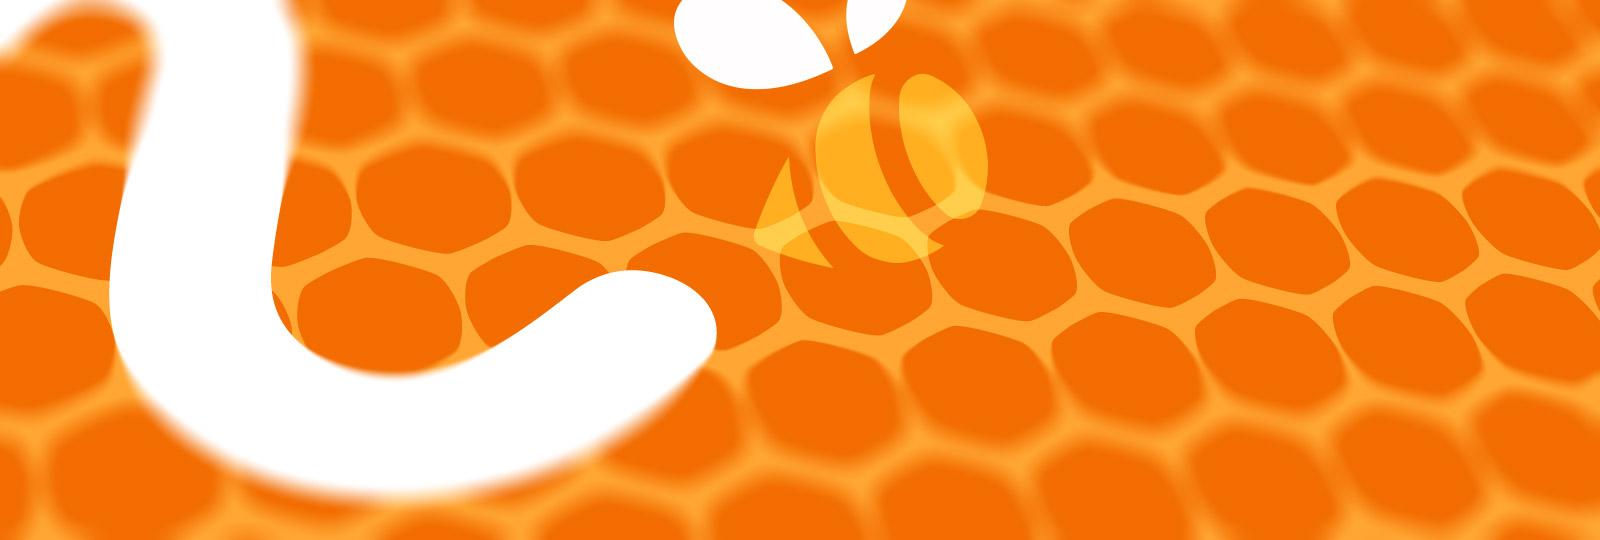 swarm3